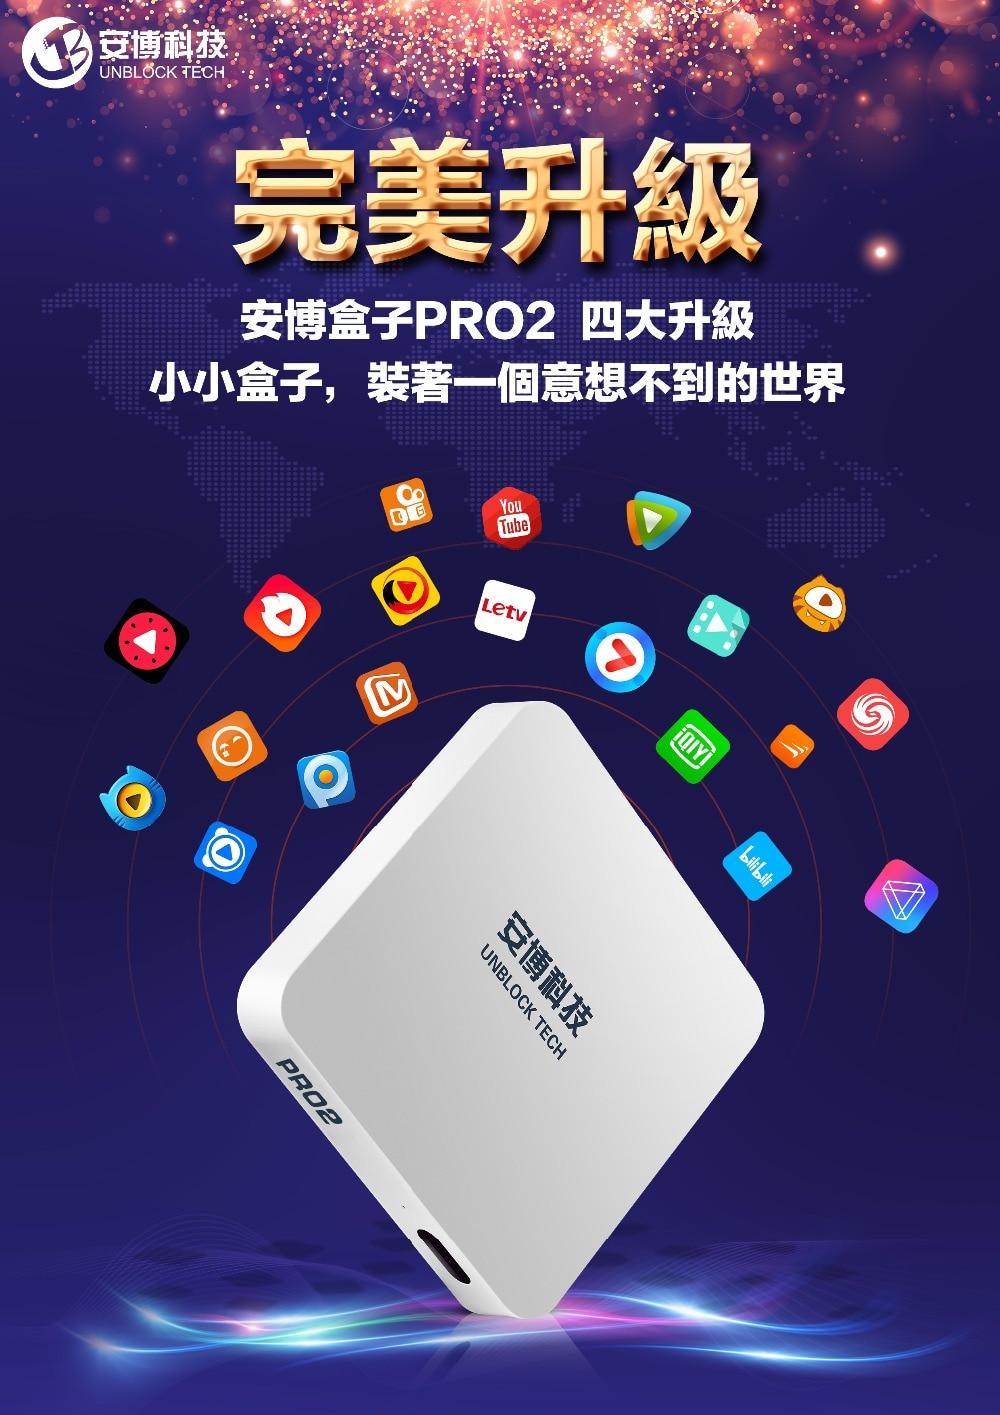 Genuine Unblock UBOX PRO2 Gen 6 16G Android 7 0 Smart TV Box HD 4K